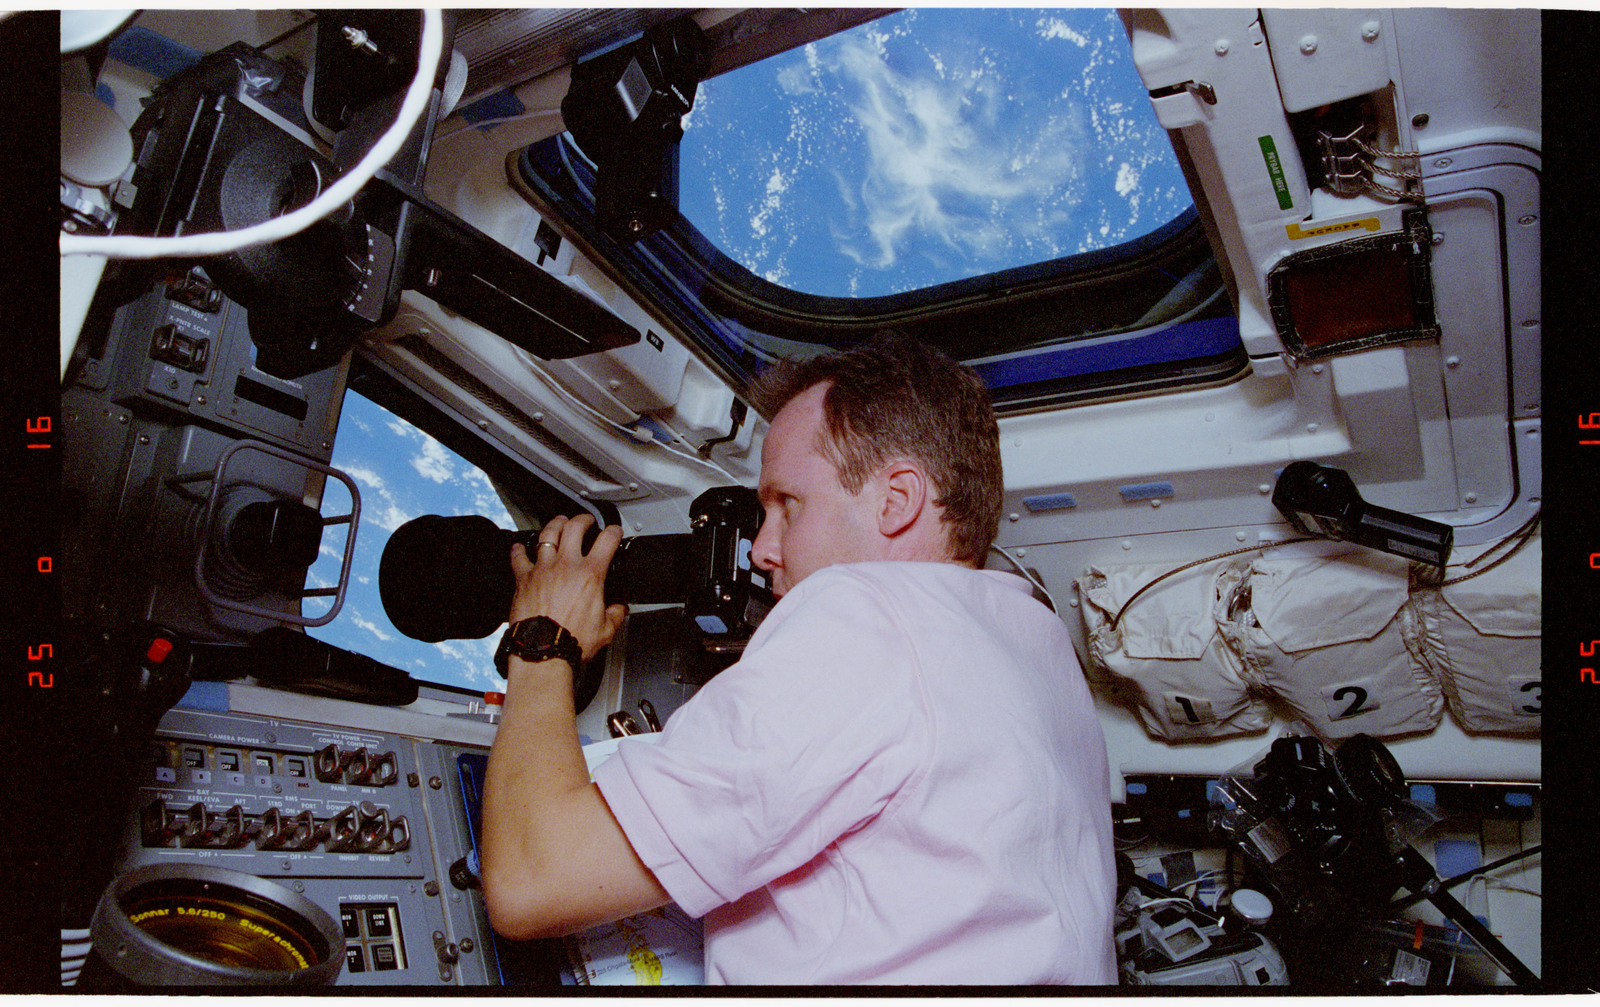 STS068-41-016 - STS-068 - STS-68 crew on orbiter flight deck